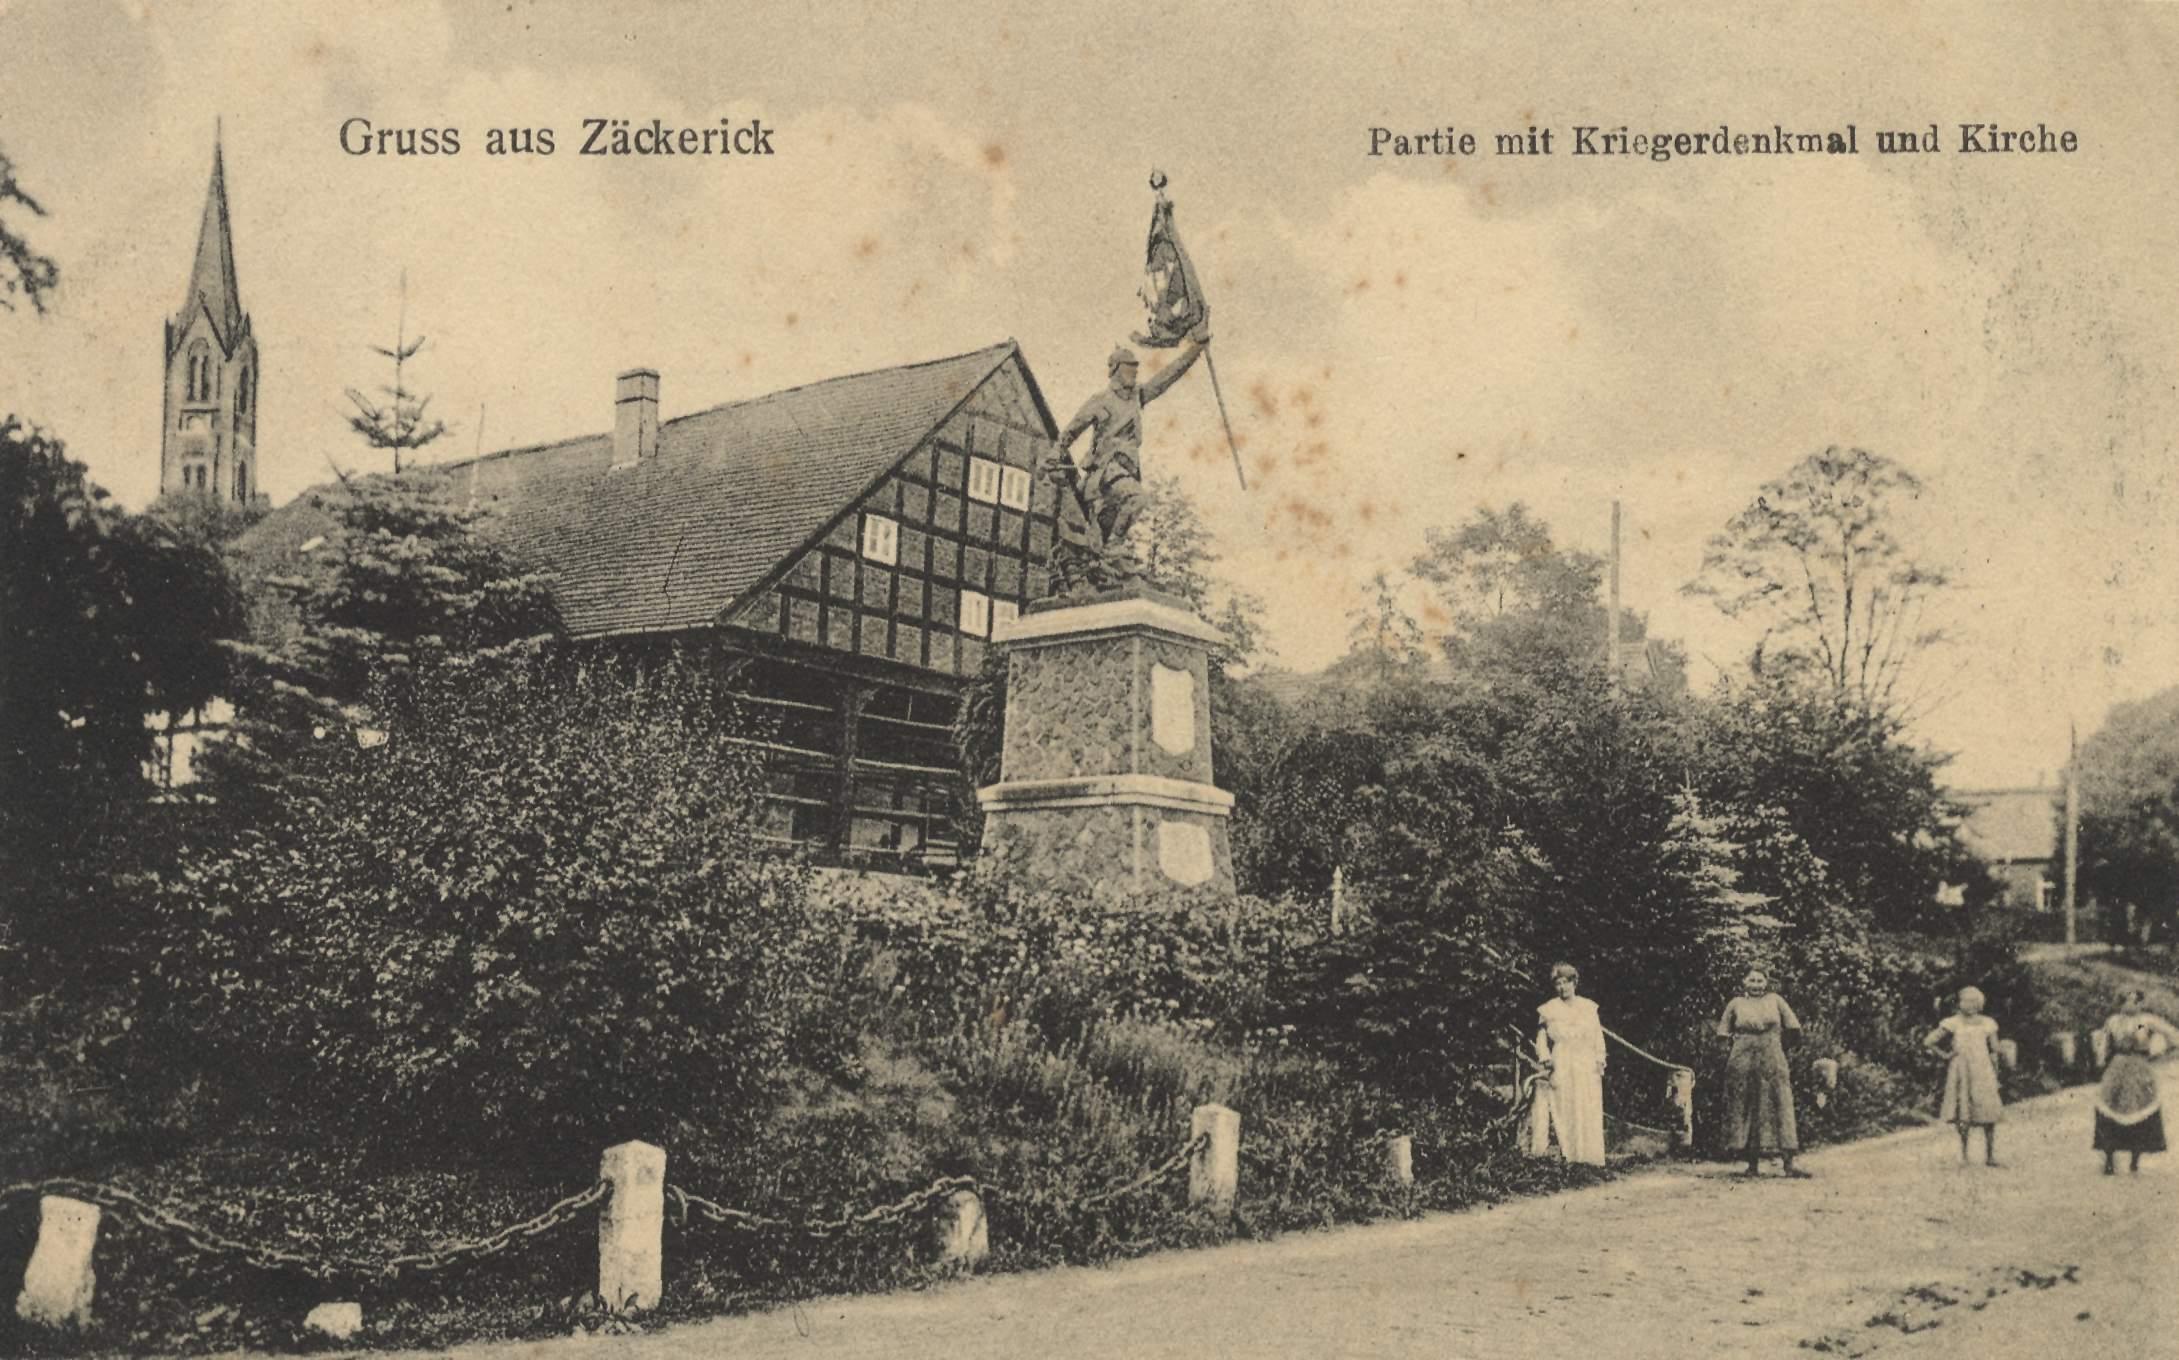 http://images.zeno.org/Ansichtskarten/I/big/AK09977a.jpg